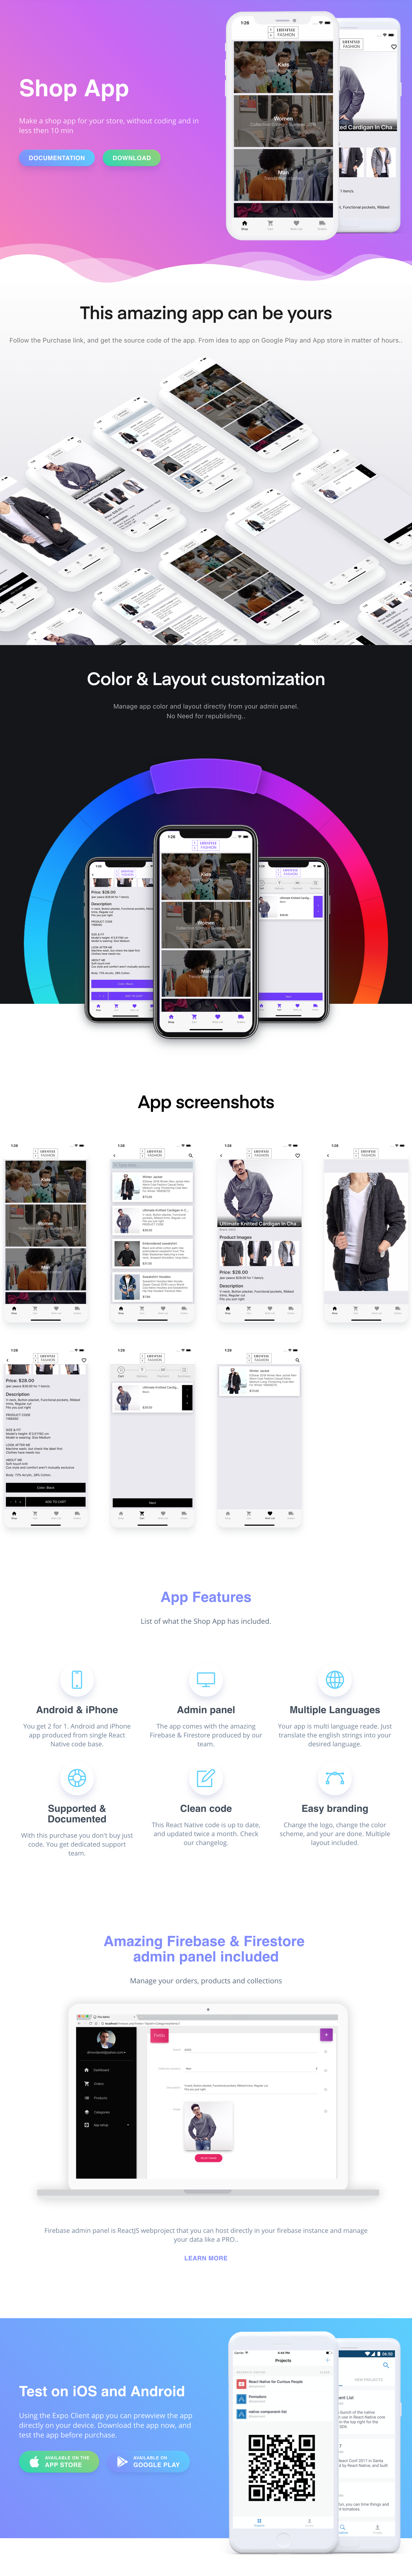 Full Mobile  Shop app - React Native Download